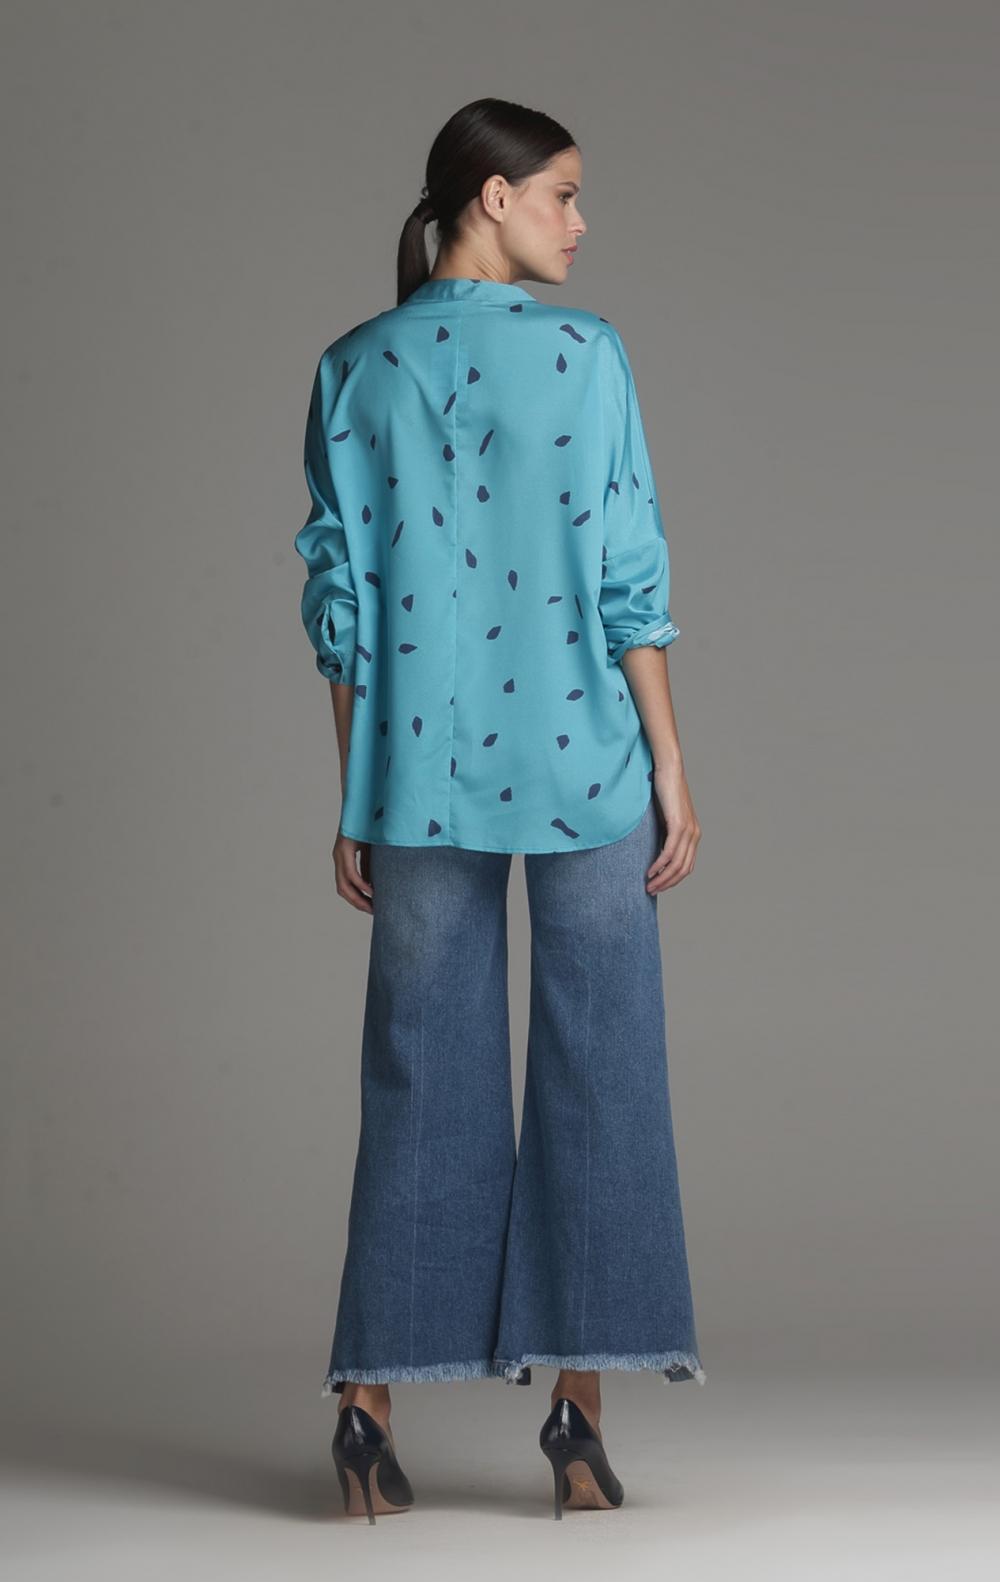 Camisa Cetim Douro Azul - Foto 2